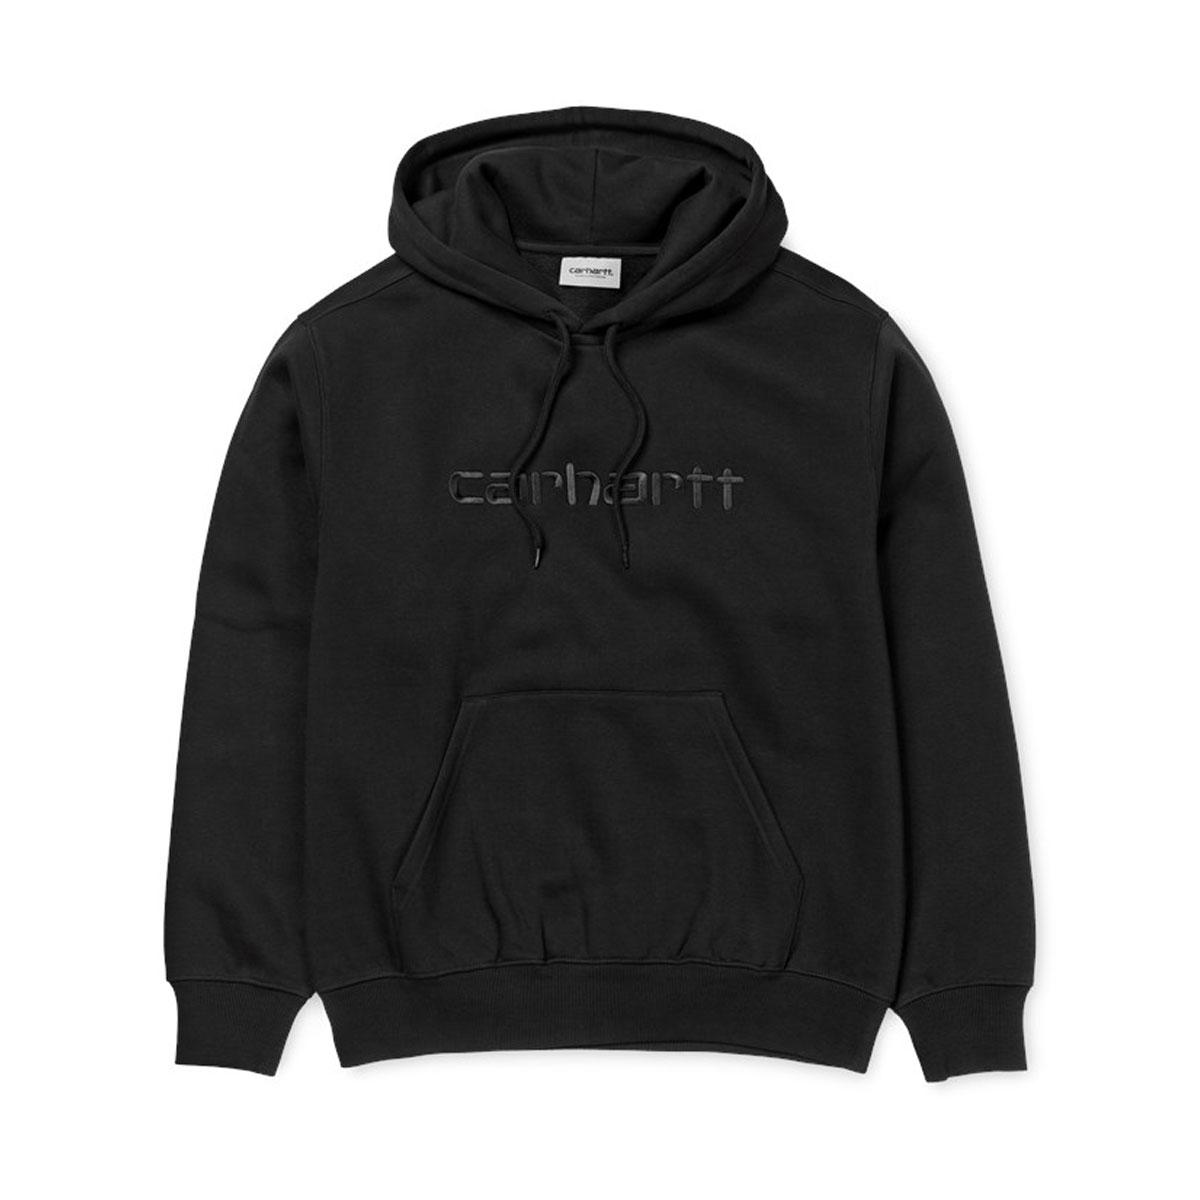 CARHARTT HOODED CARHARTT SWEATSHIRT( カーハート フーデッド カーハート スウェットシャツ)Black/ Black【メンズ レディース パーカー】18FW-I